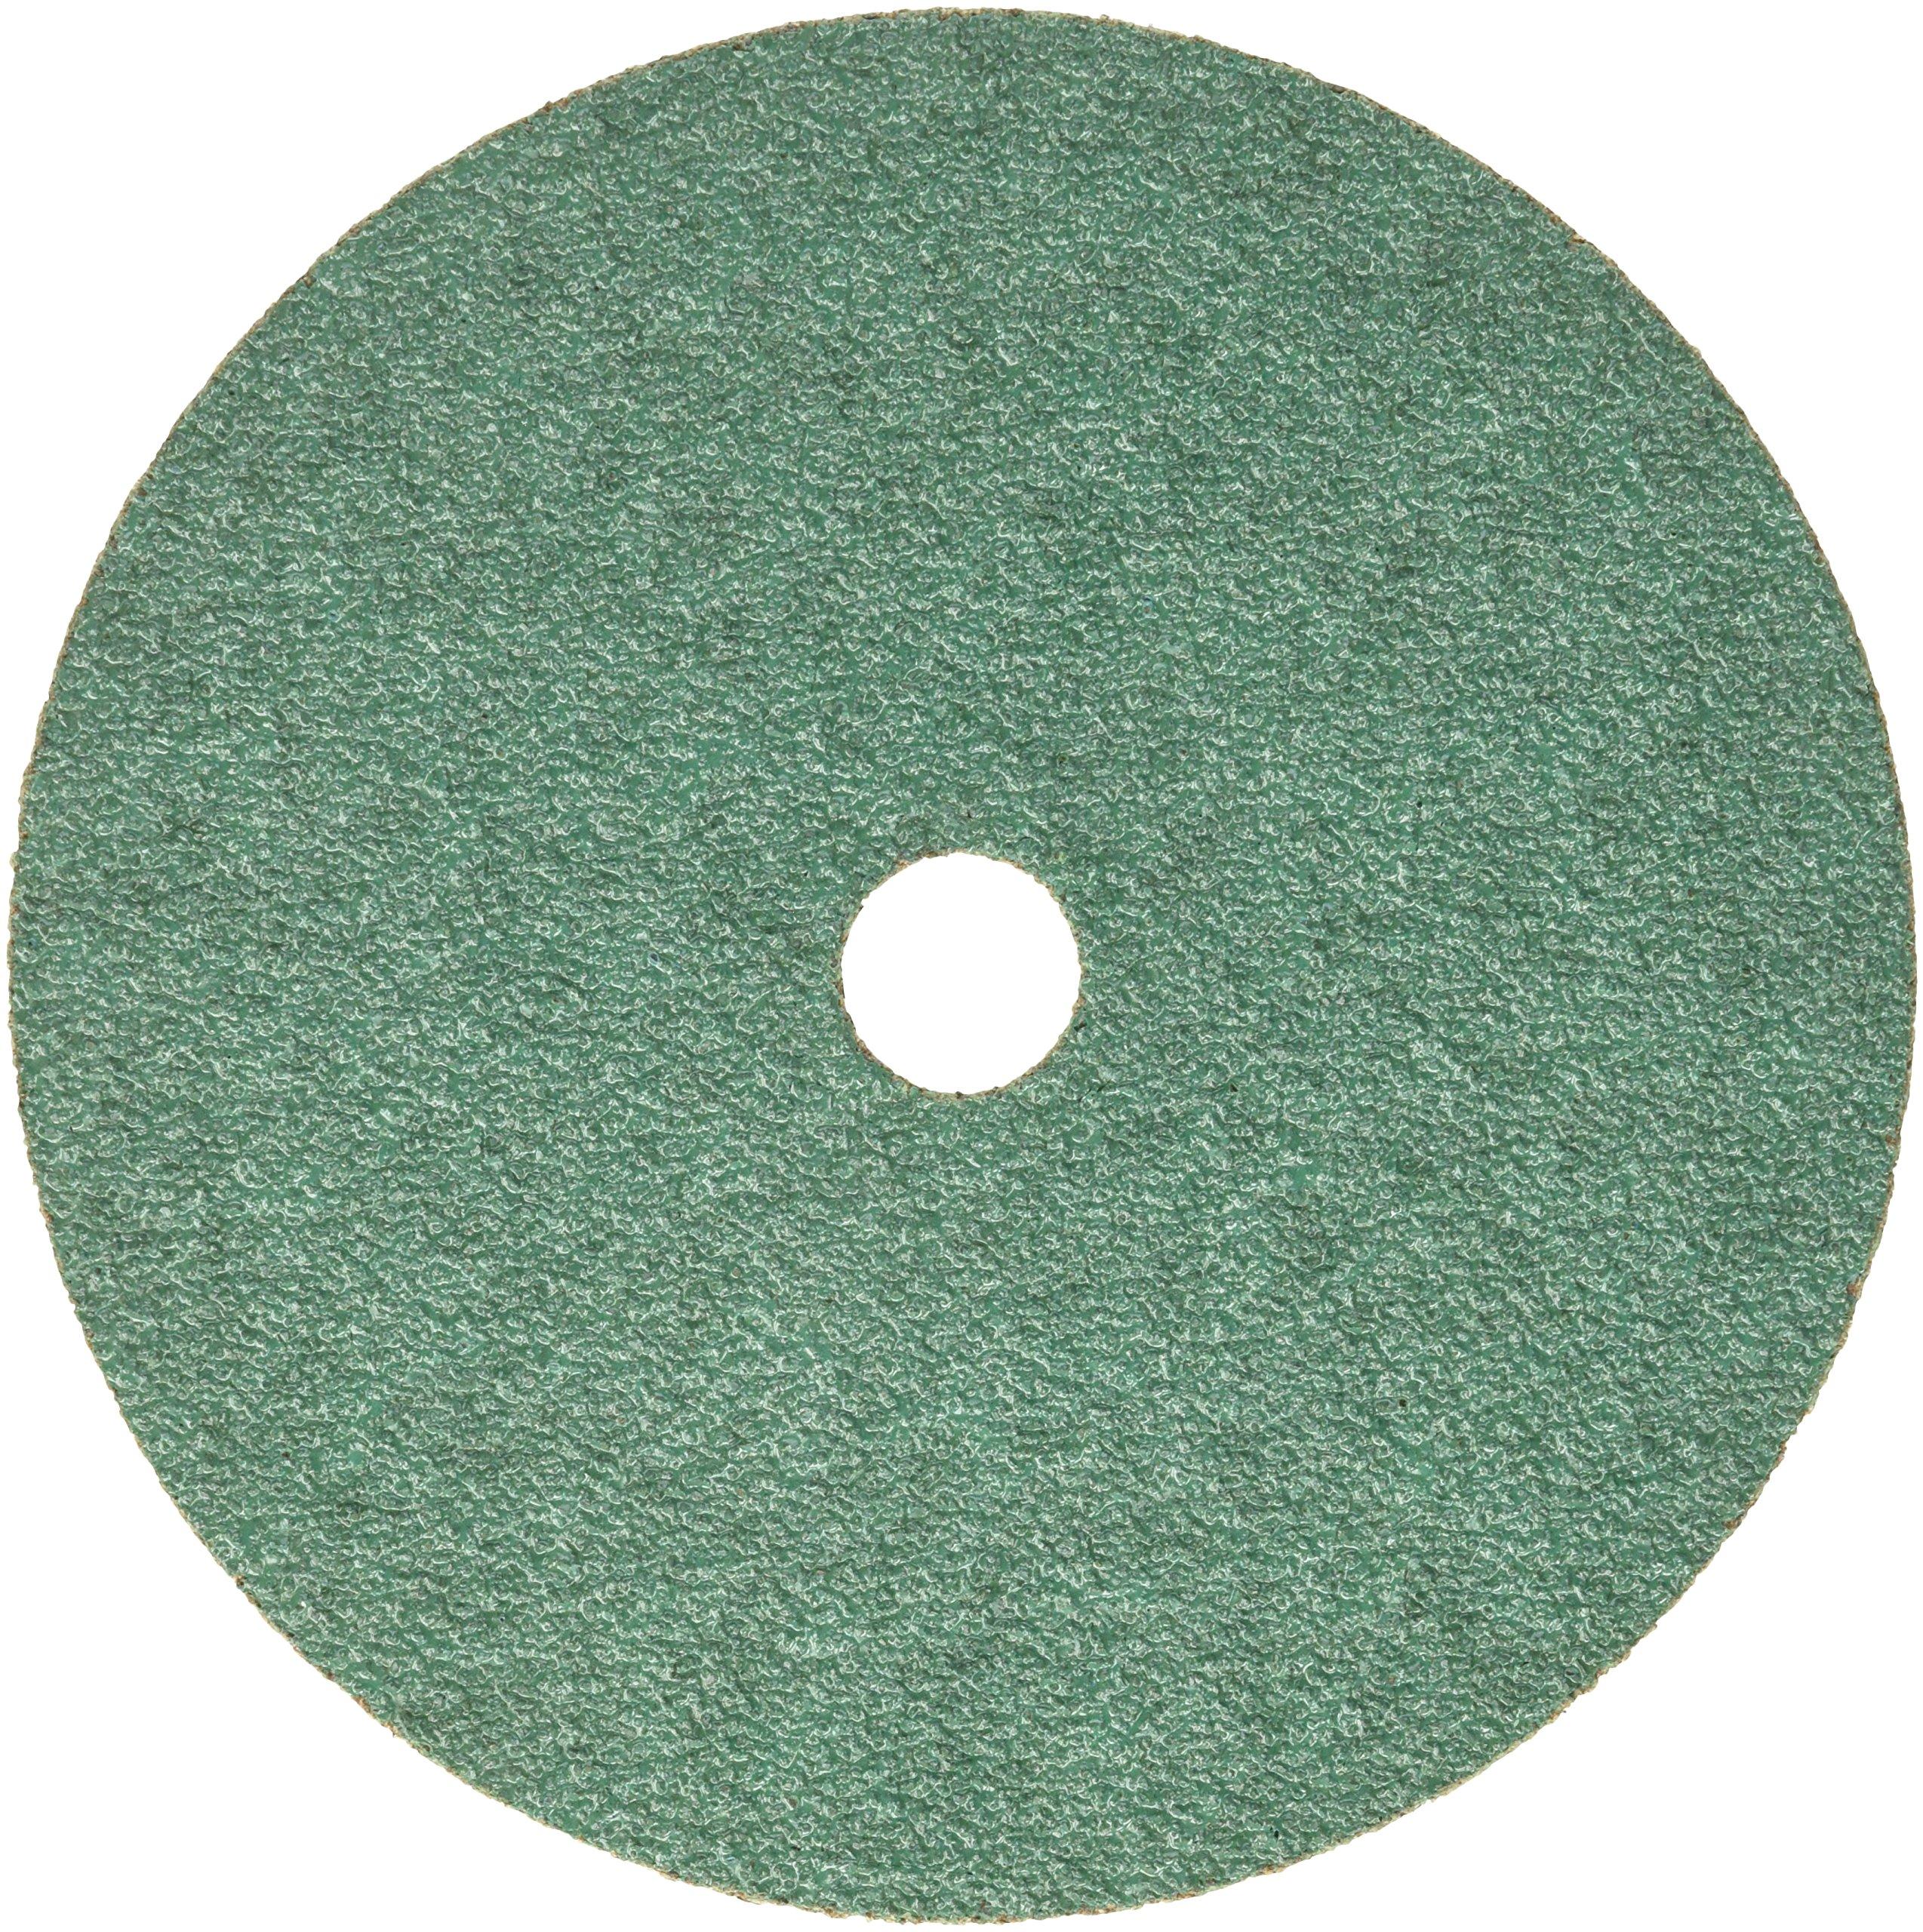 Sunmight 72402 1 Pack 7'' Alumina Zirconia Fibre Disc (Sundisc Grit 36) by Sunmight